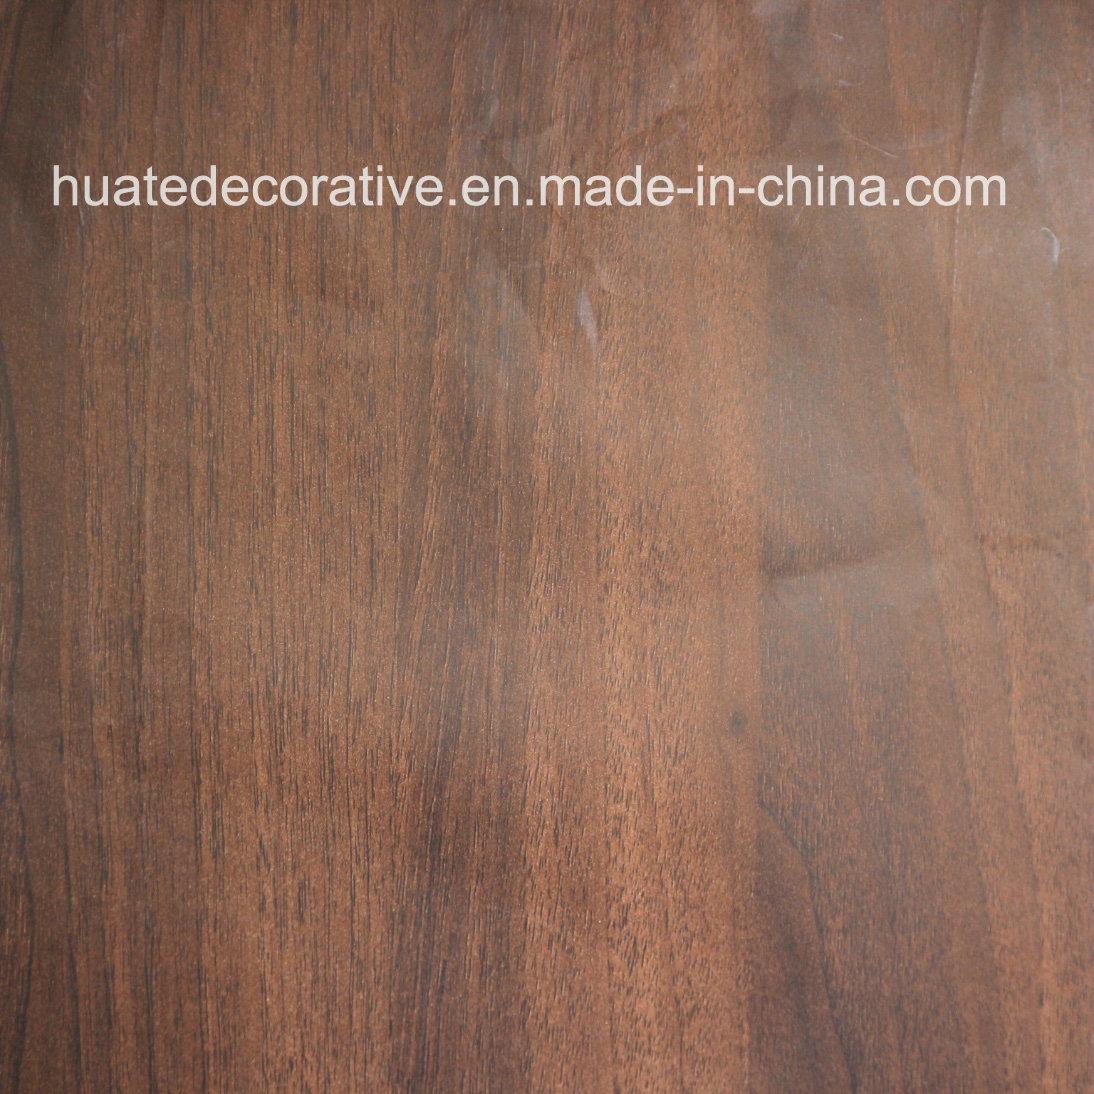 Wild Walnut Design Decorative Paper for Furniture